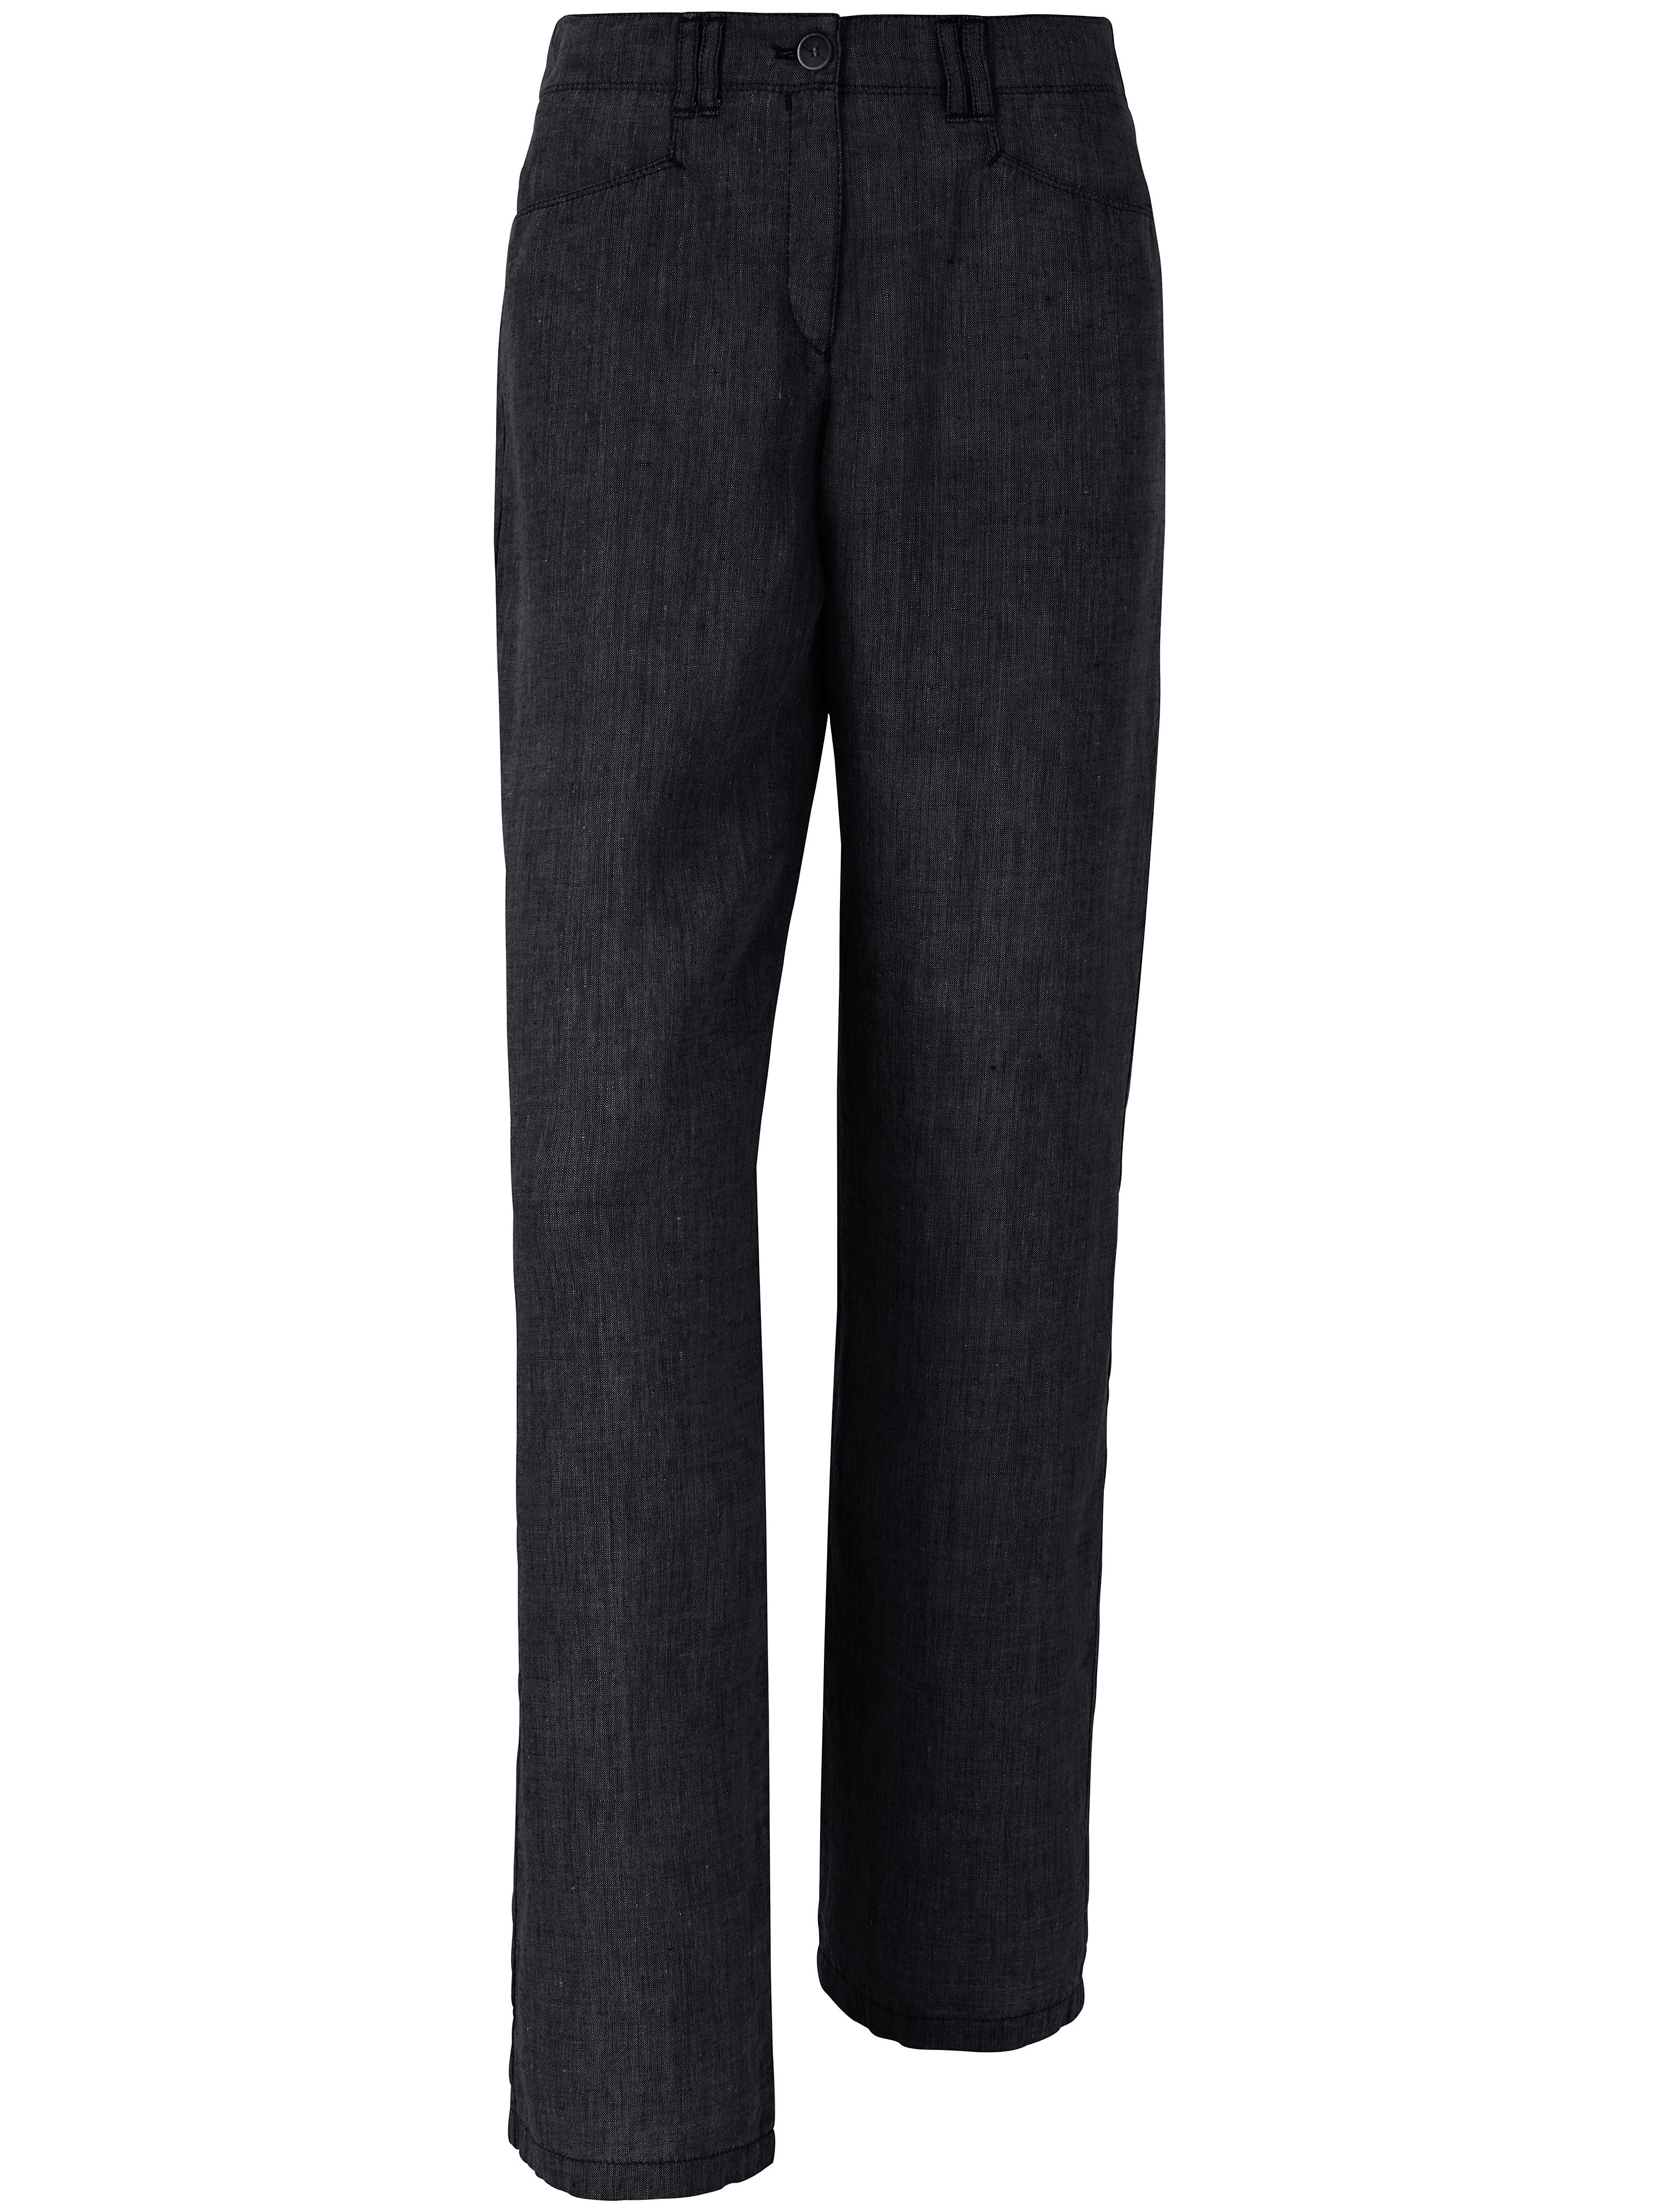 Le pantalon Feminine Fit pur lin, modèle FARINA  Brax Feel Good noir taille 40